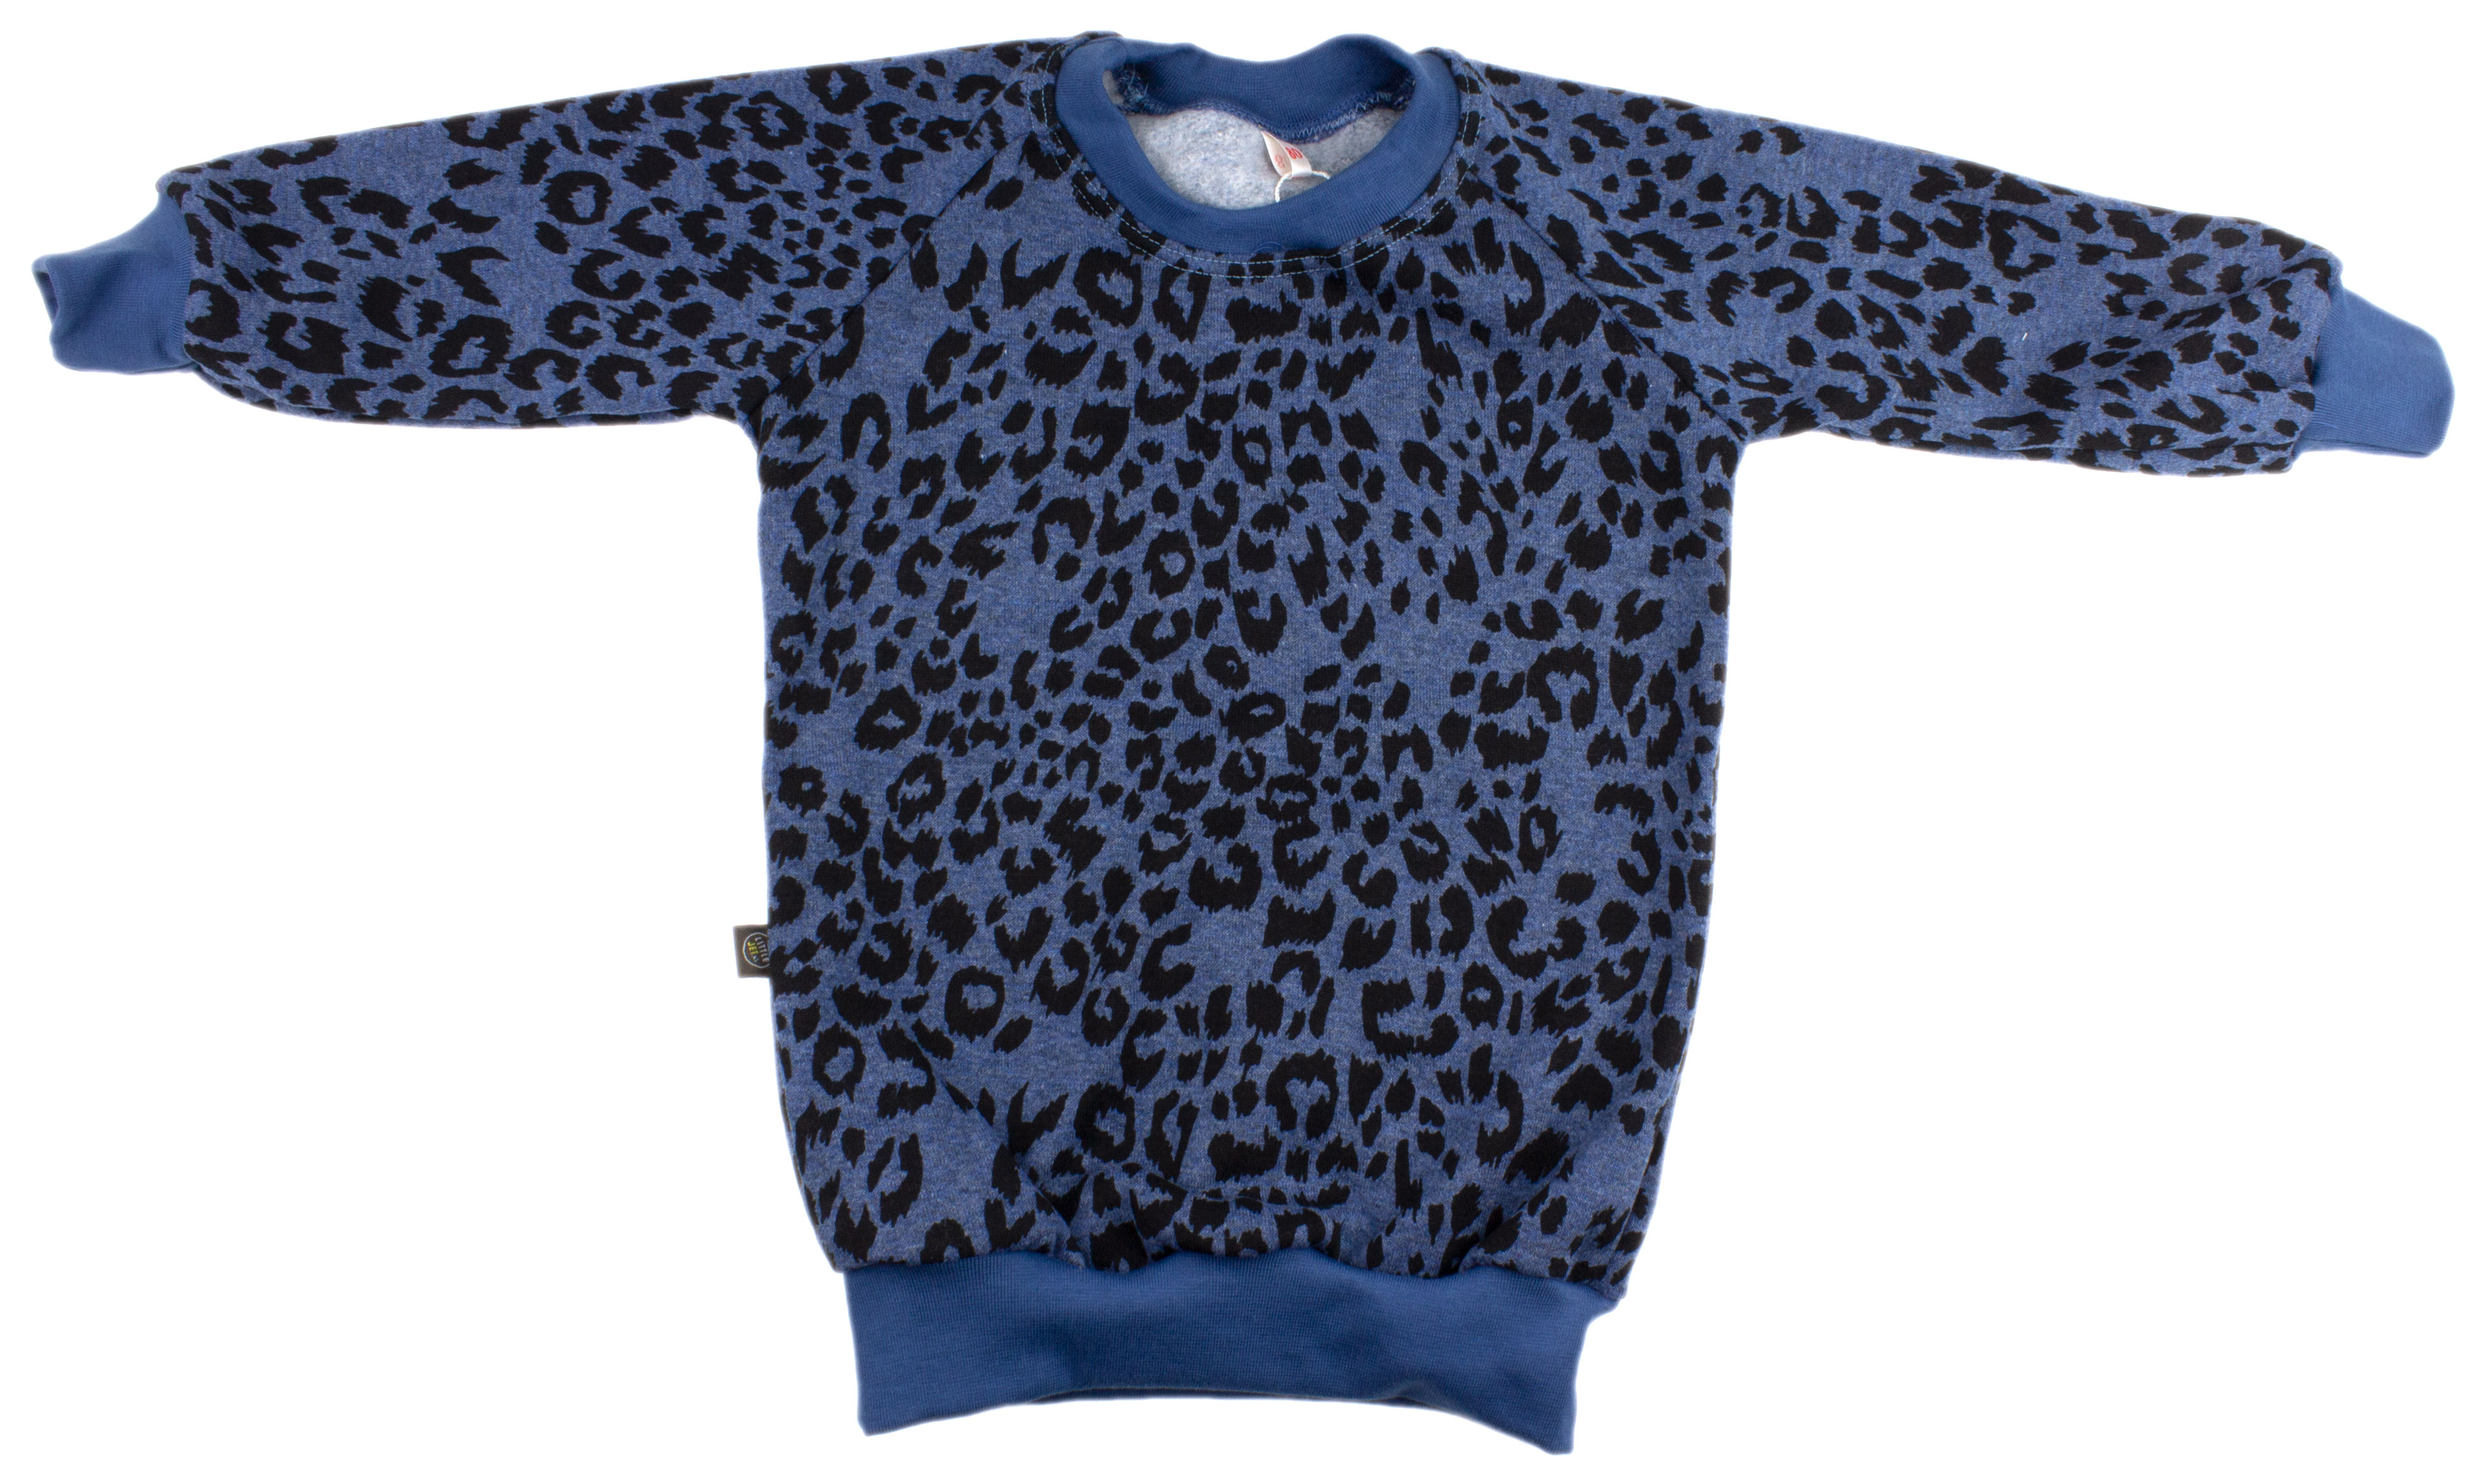 Trui Met Panterprint.Little Jet Sweater Jeansblauw Met Panterprint